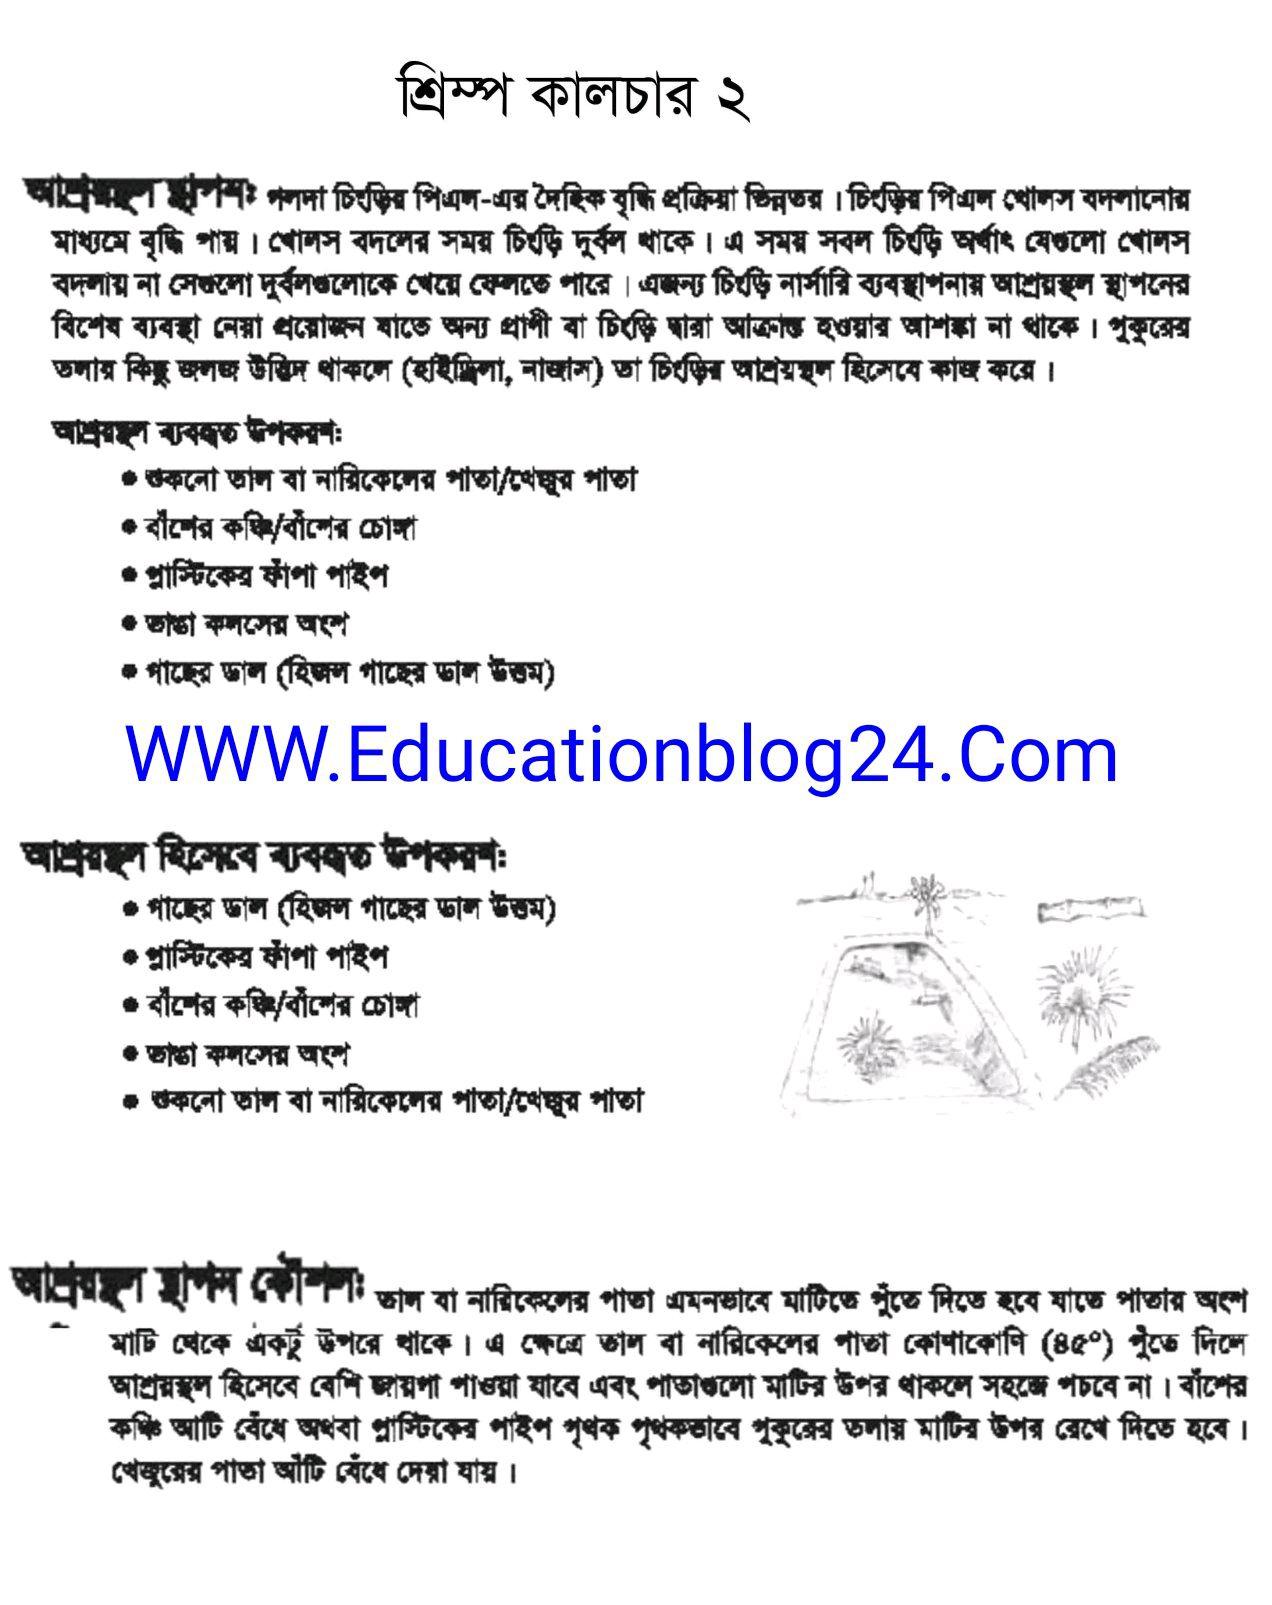 SSC / Dakhil (Vocational) Shrimp Culture and Breeding Assignment Answer 2021 12